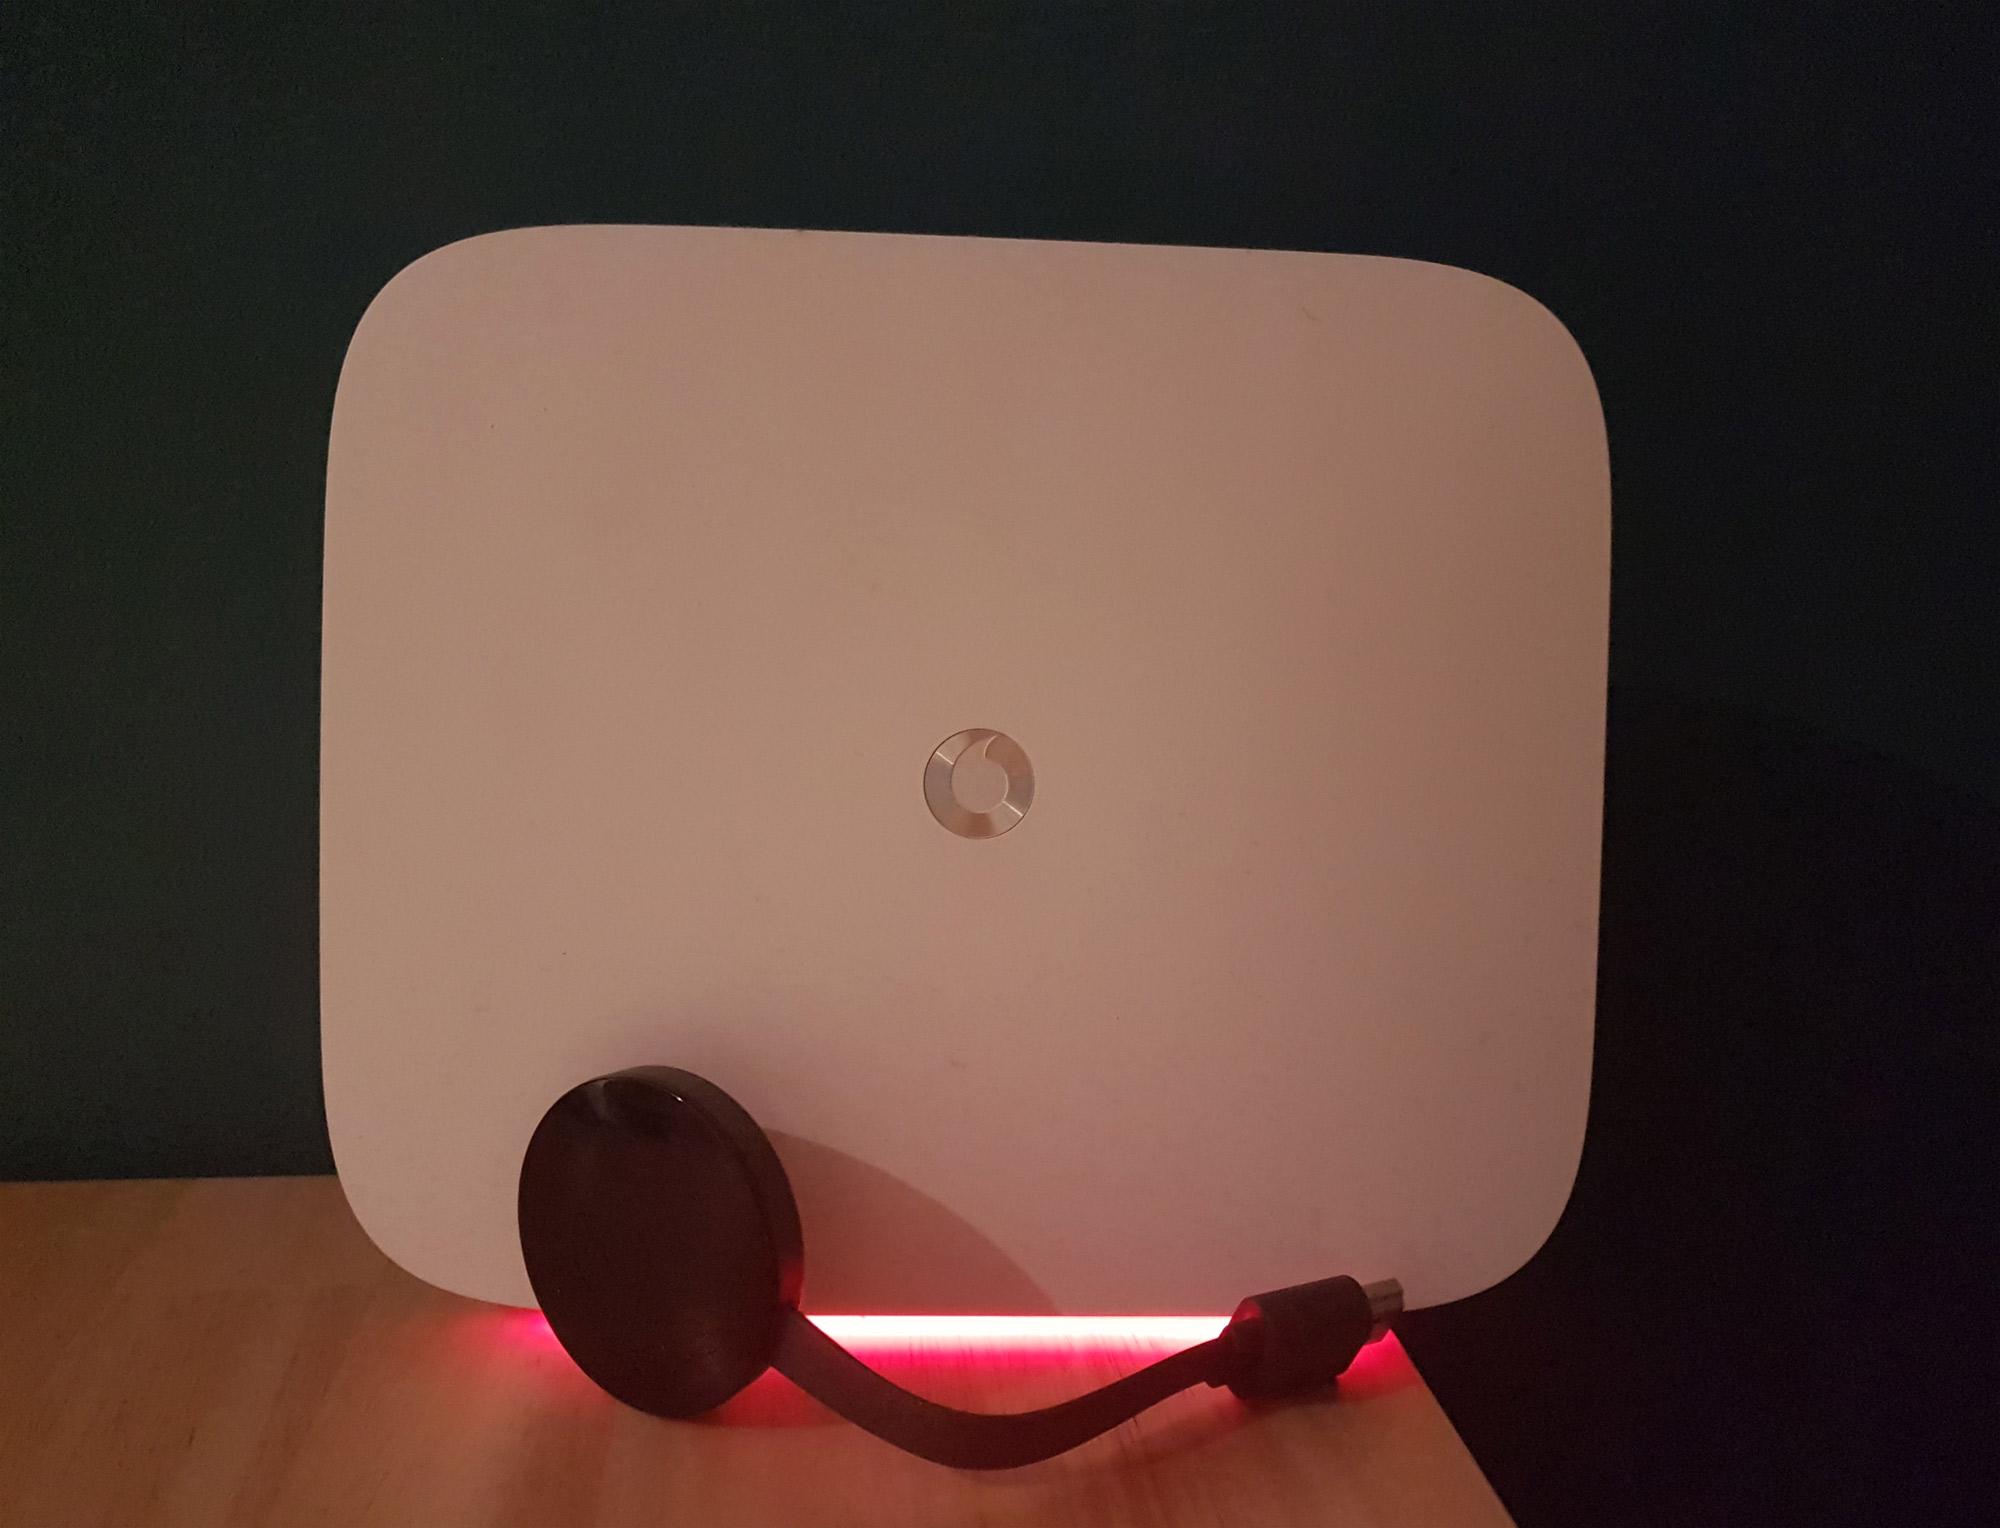 Easybox-804 und Chromecast 2